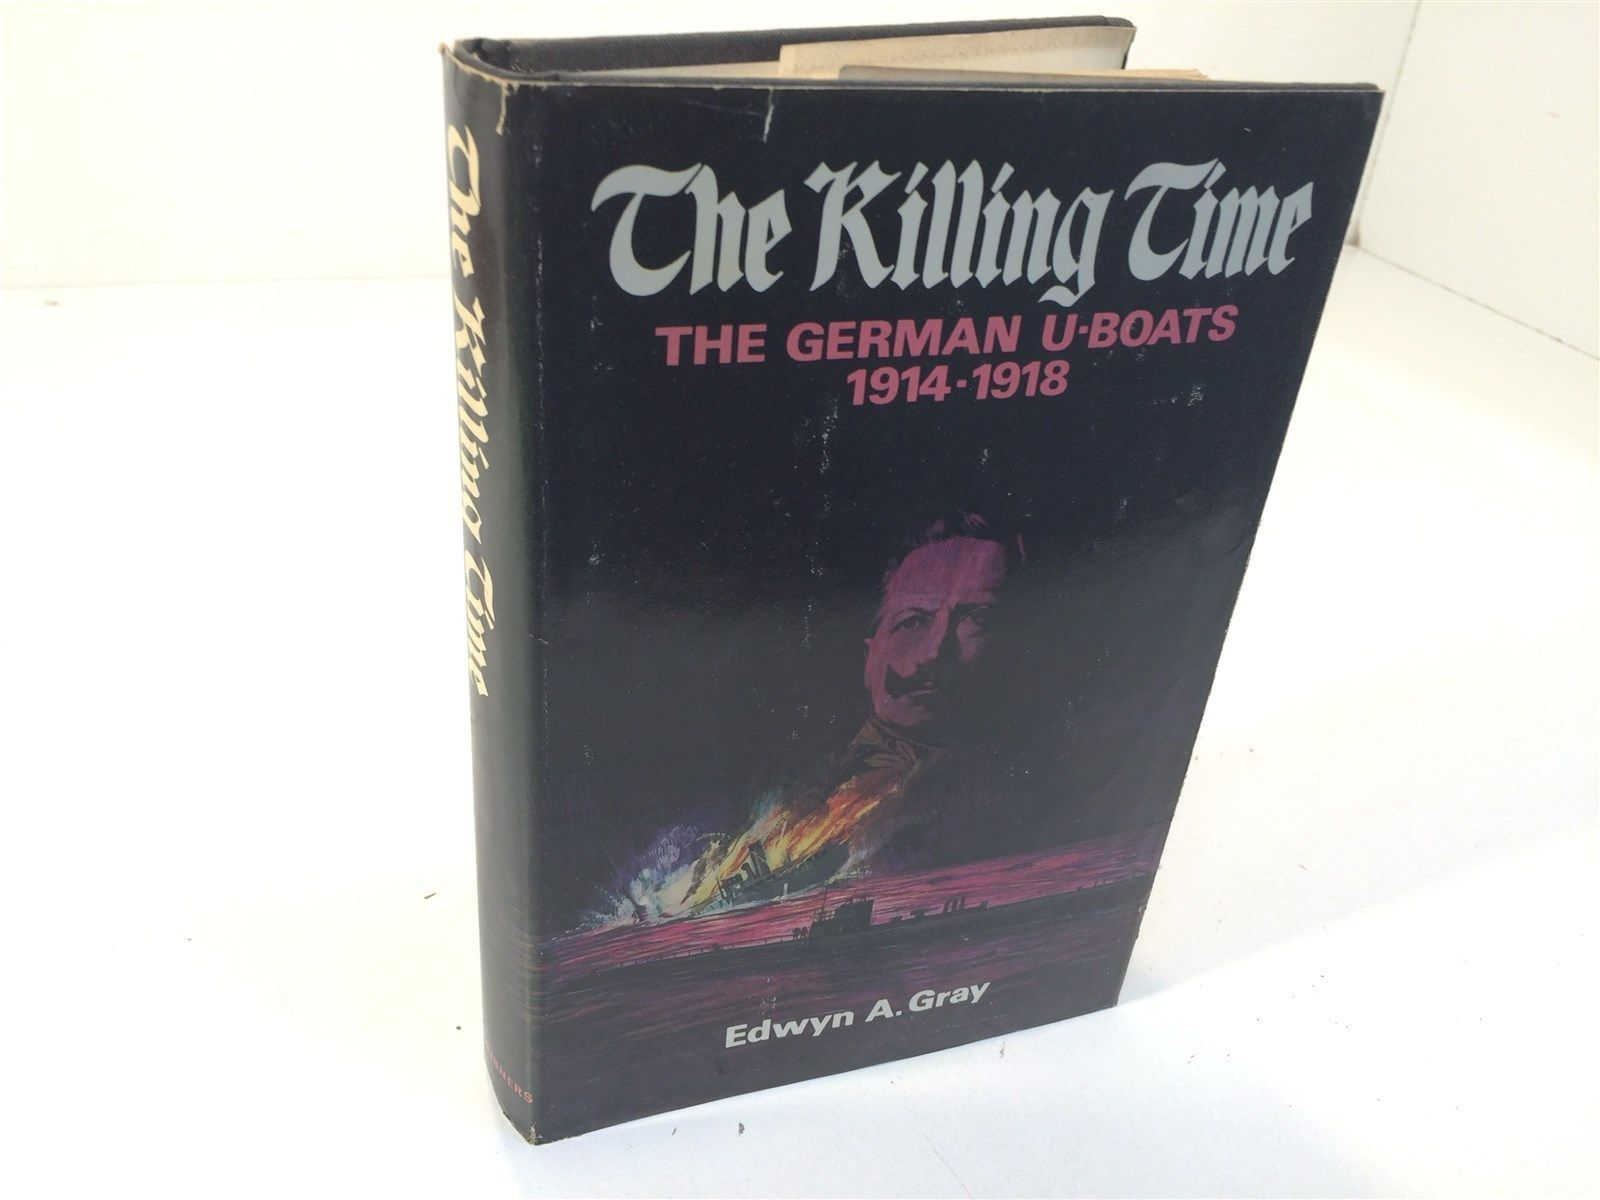 The Killing Time: The German U-Boats 1914-1918 by Edwyn A. Gray HC/DJ 1972